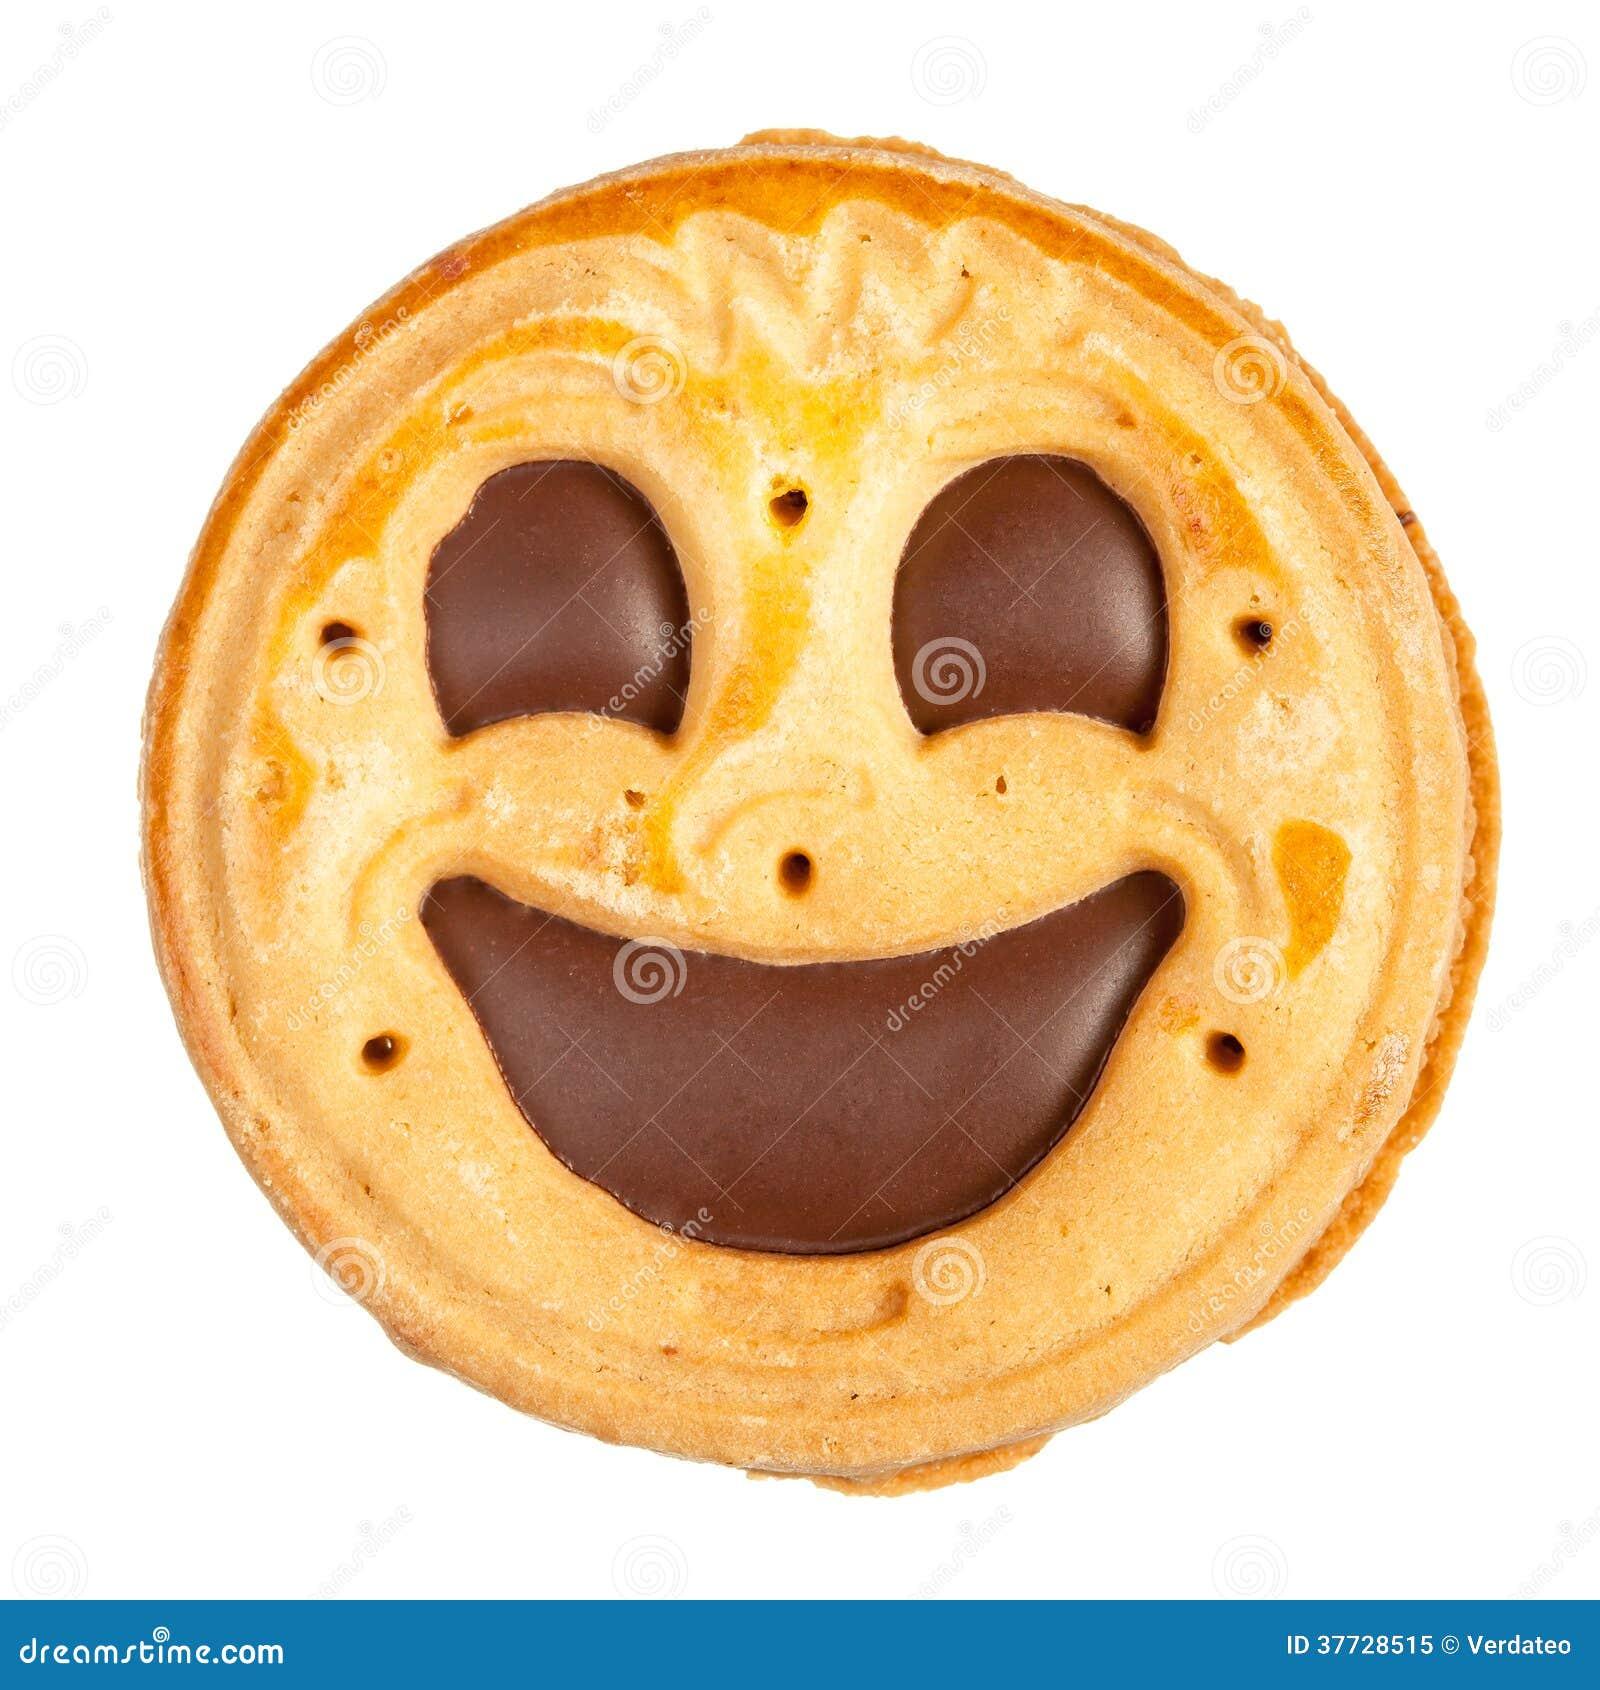 rond-koekje-met-geïsoleerde-glimlach-37728515.jpg